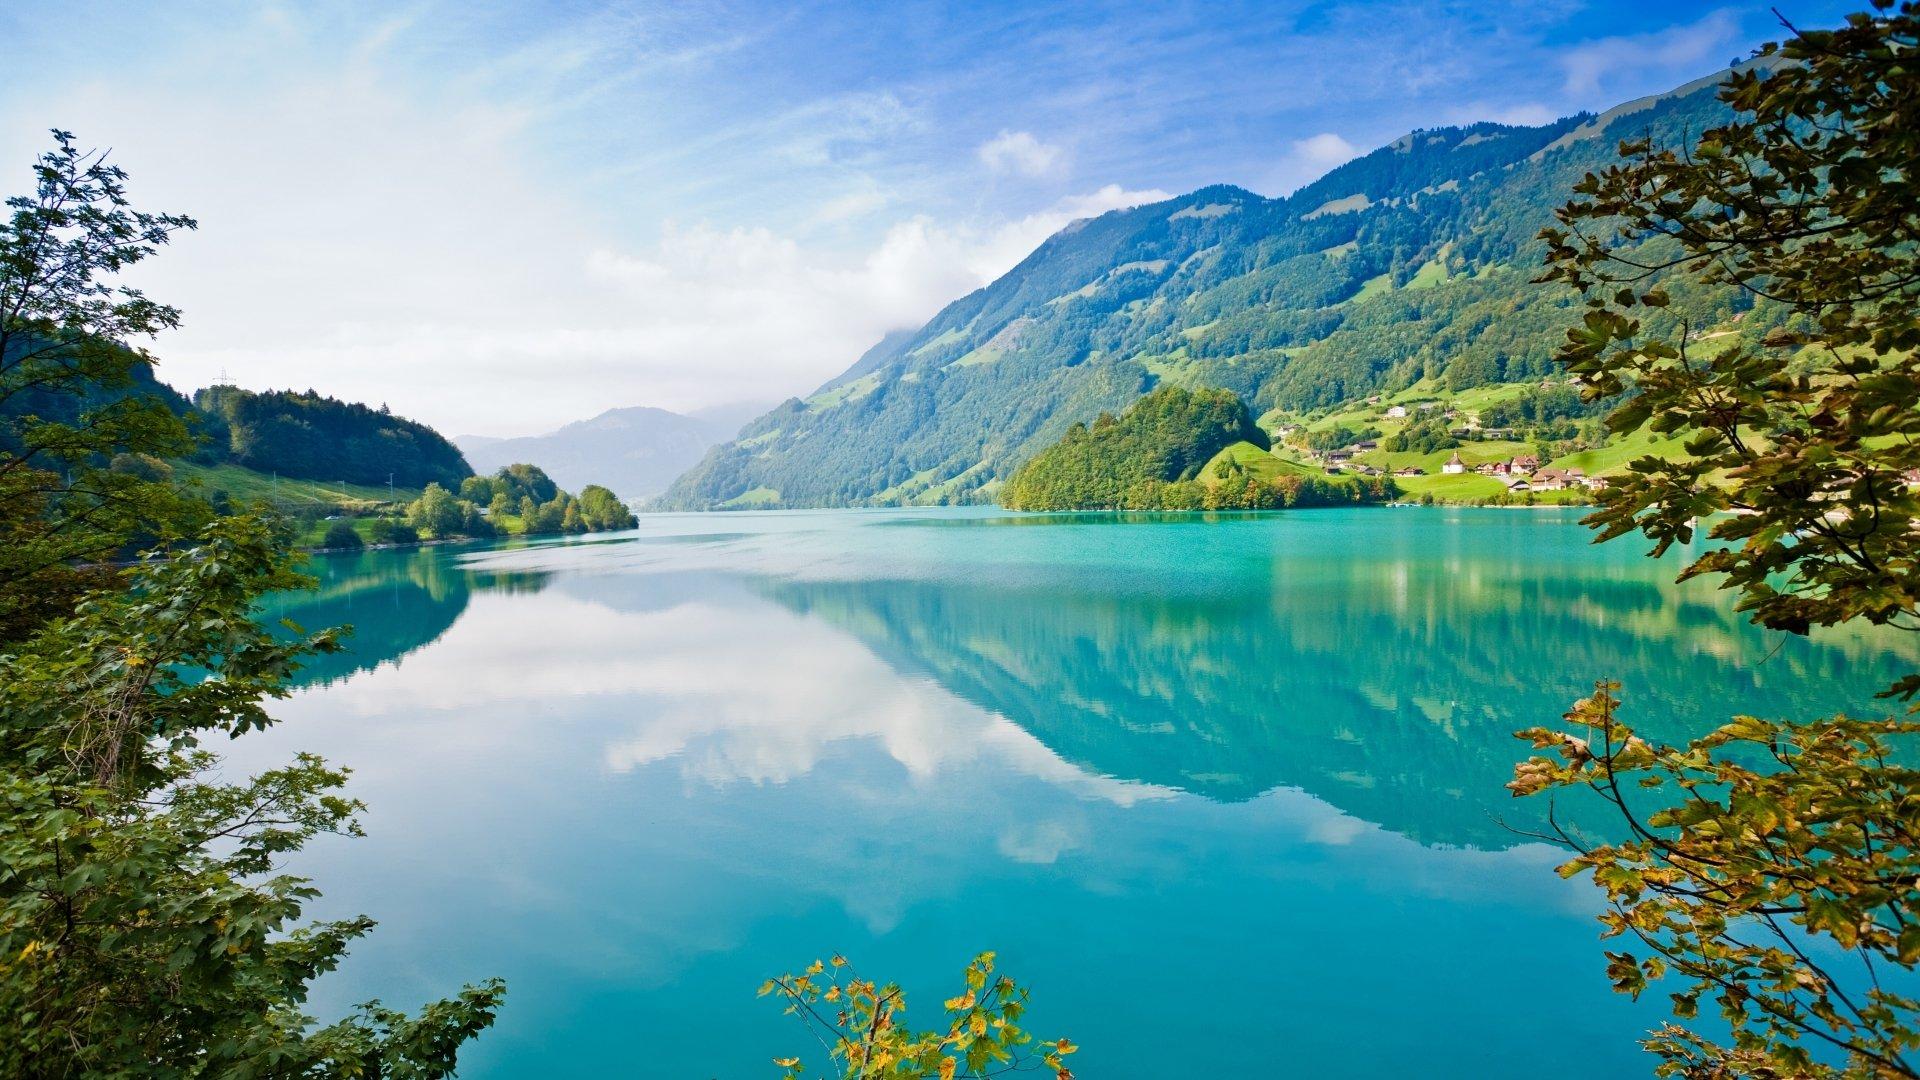 Earth - Lake  Reflection Mountain Wallpaper